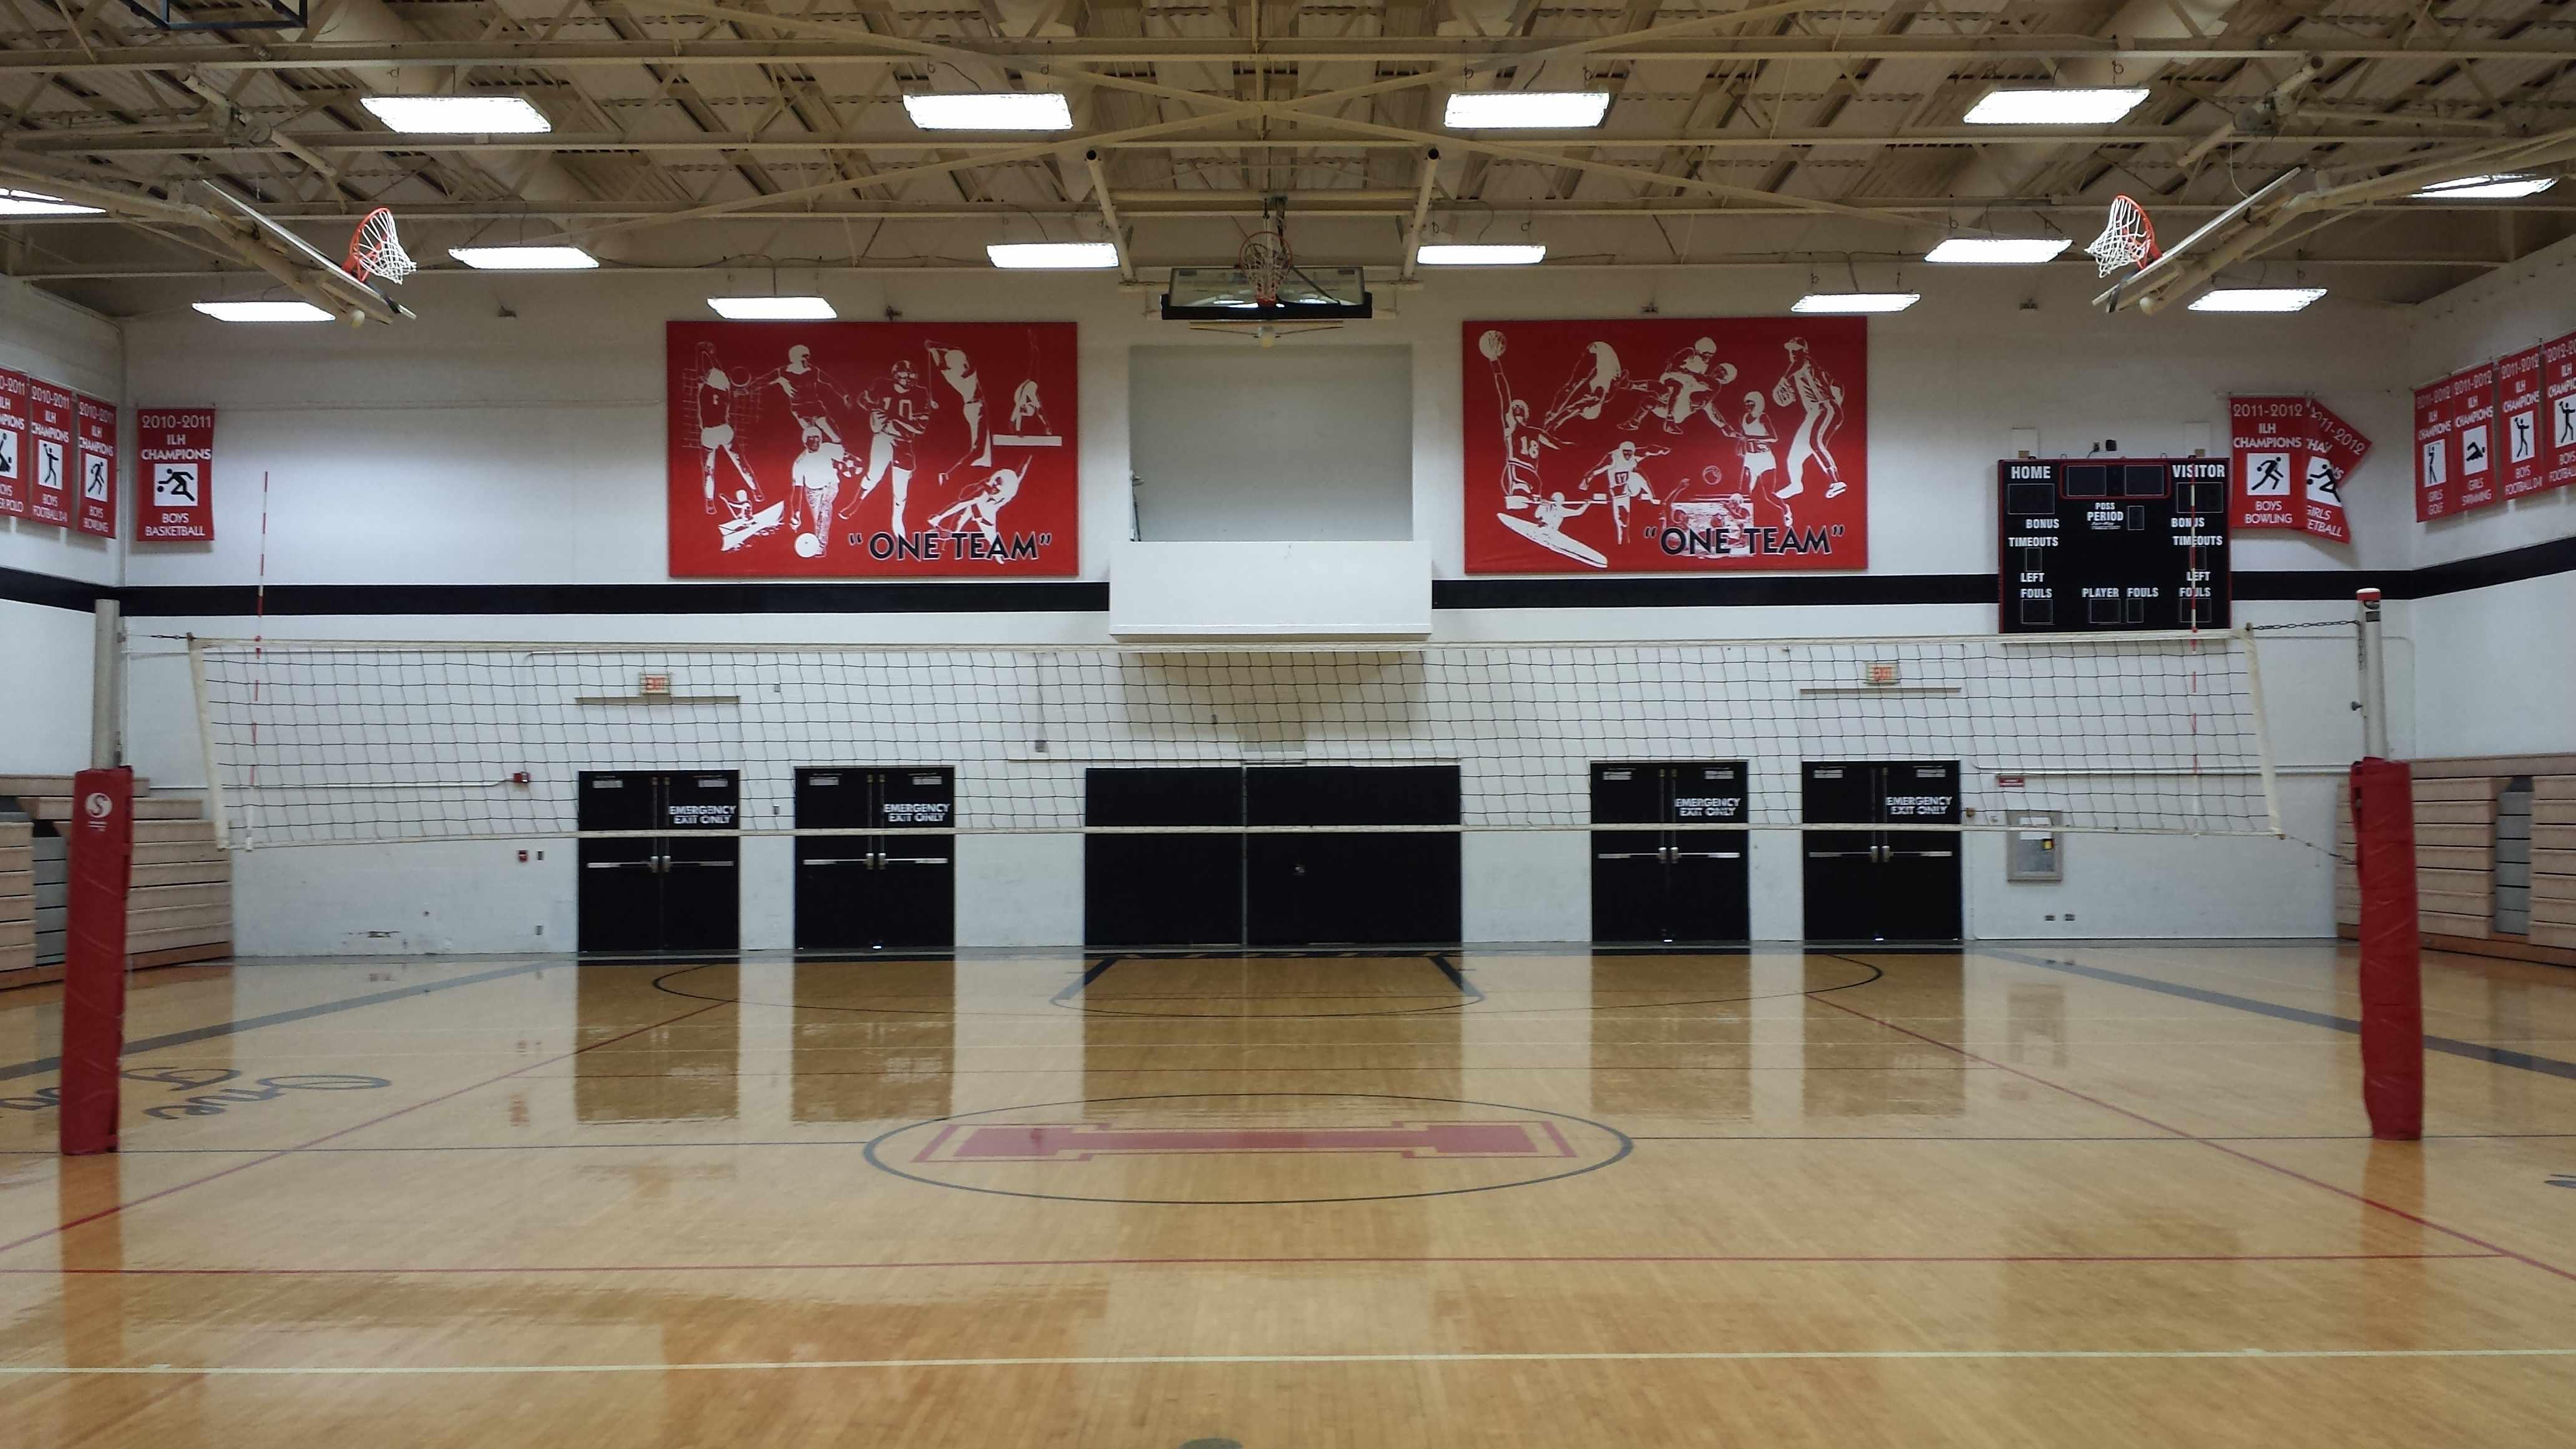 Lower Gym Volleyball